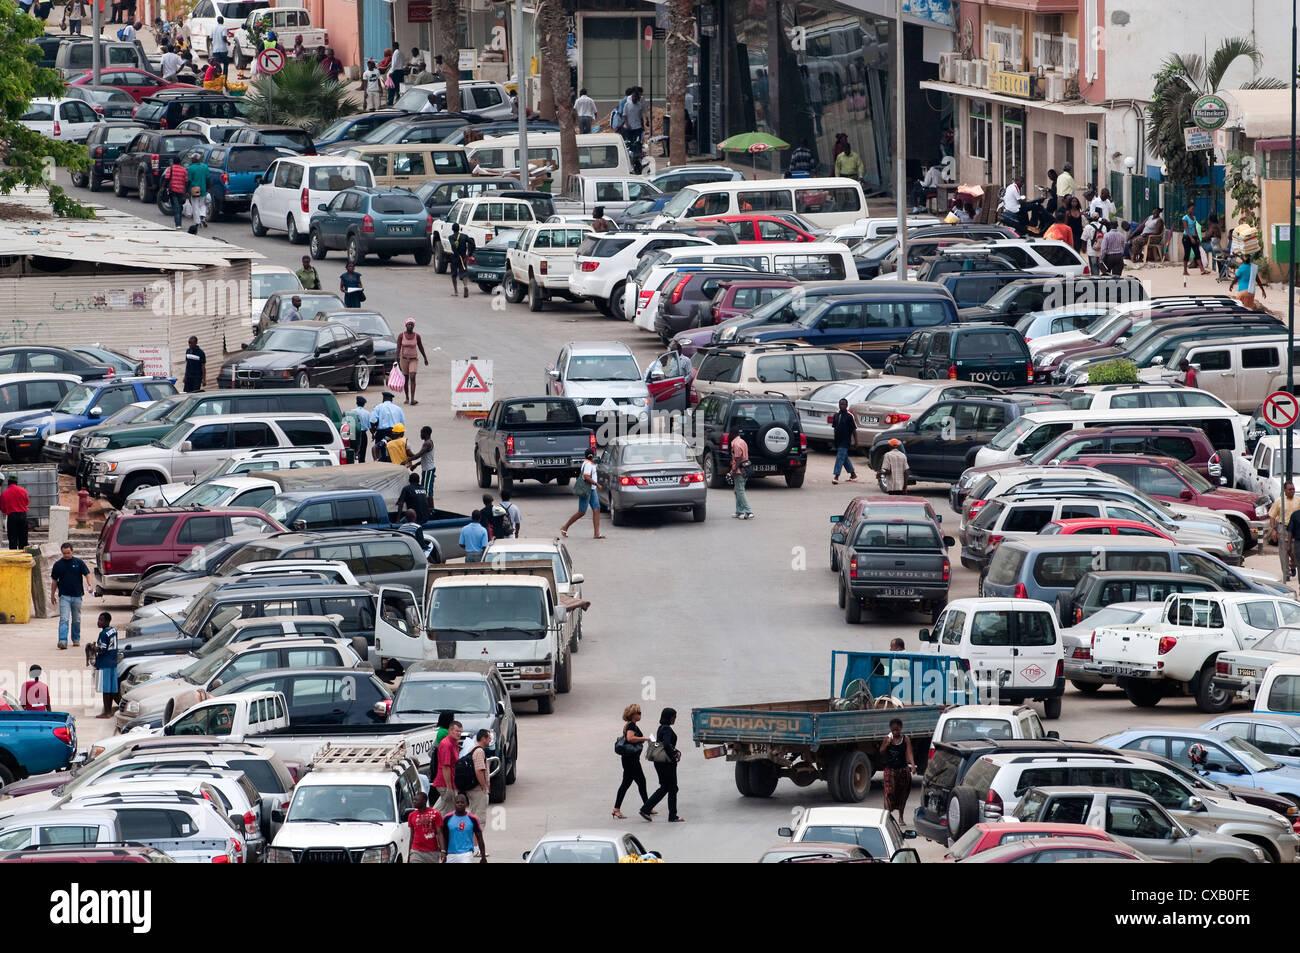 Straßenszenen in Luanda, Angola, Afrika Stockbild